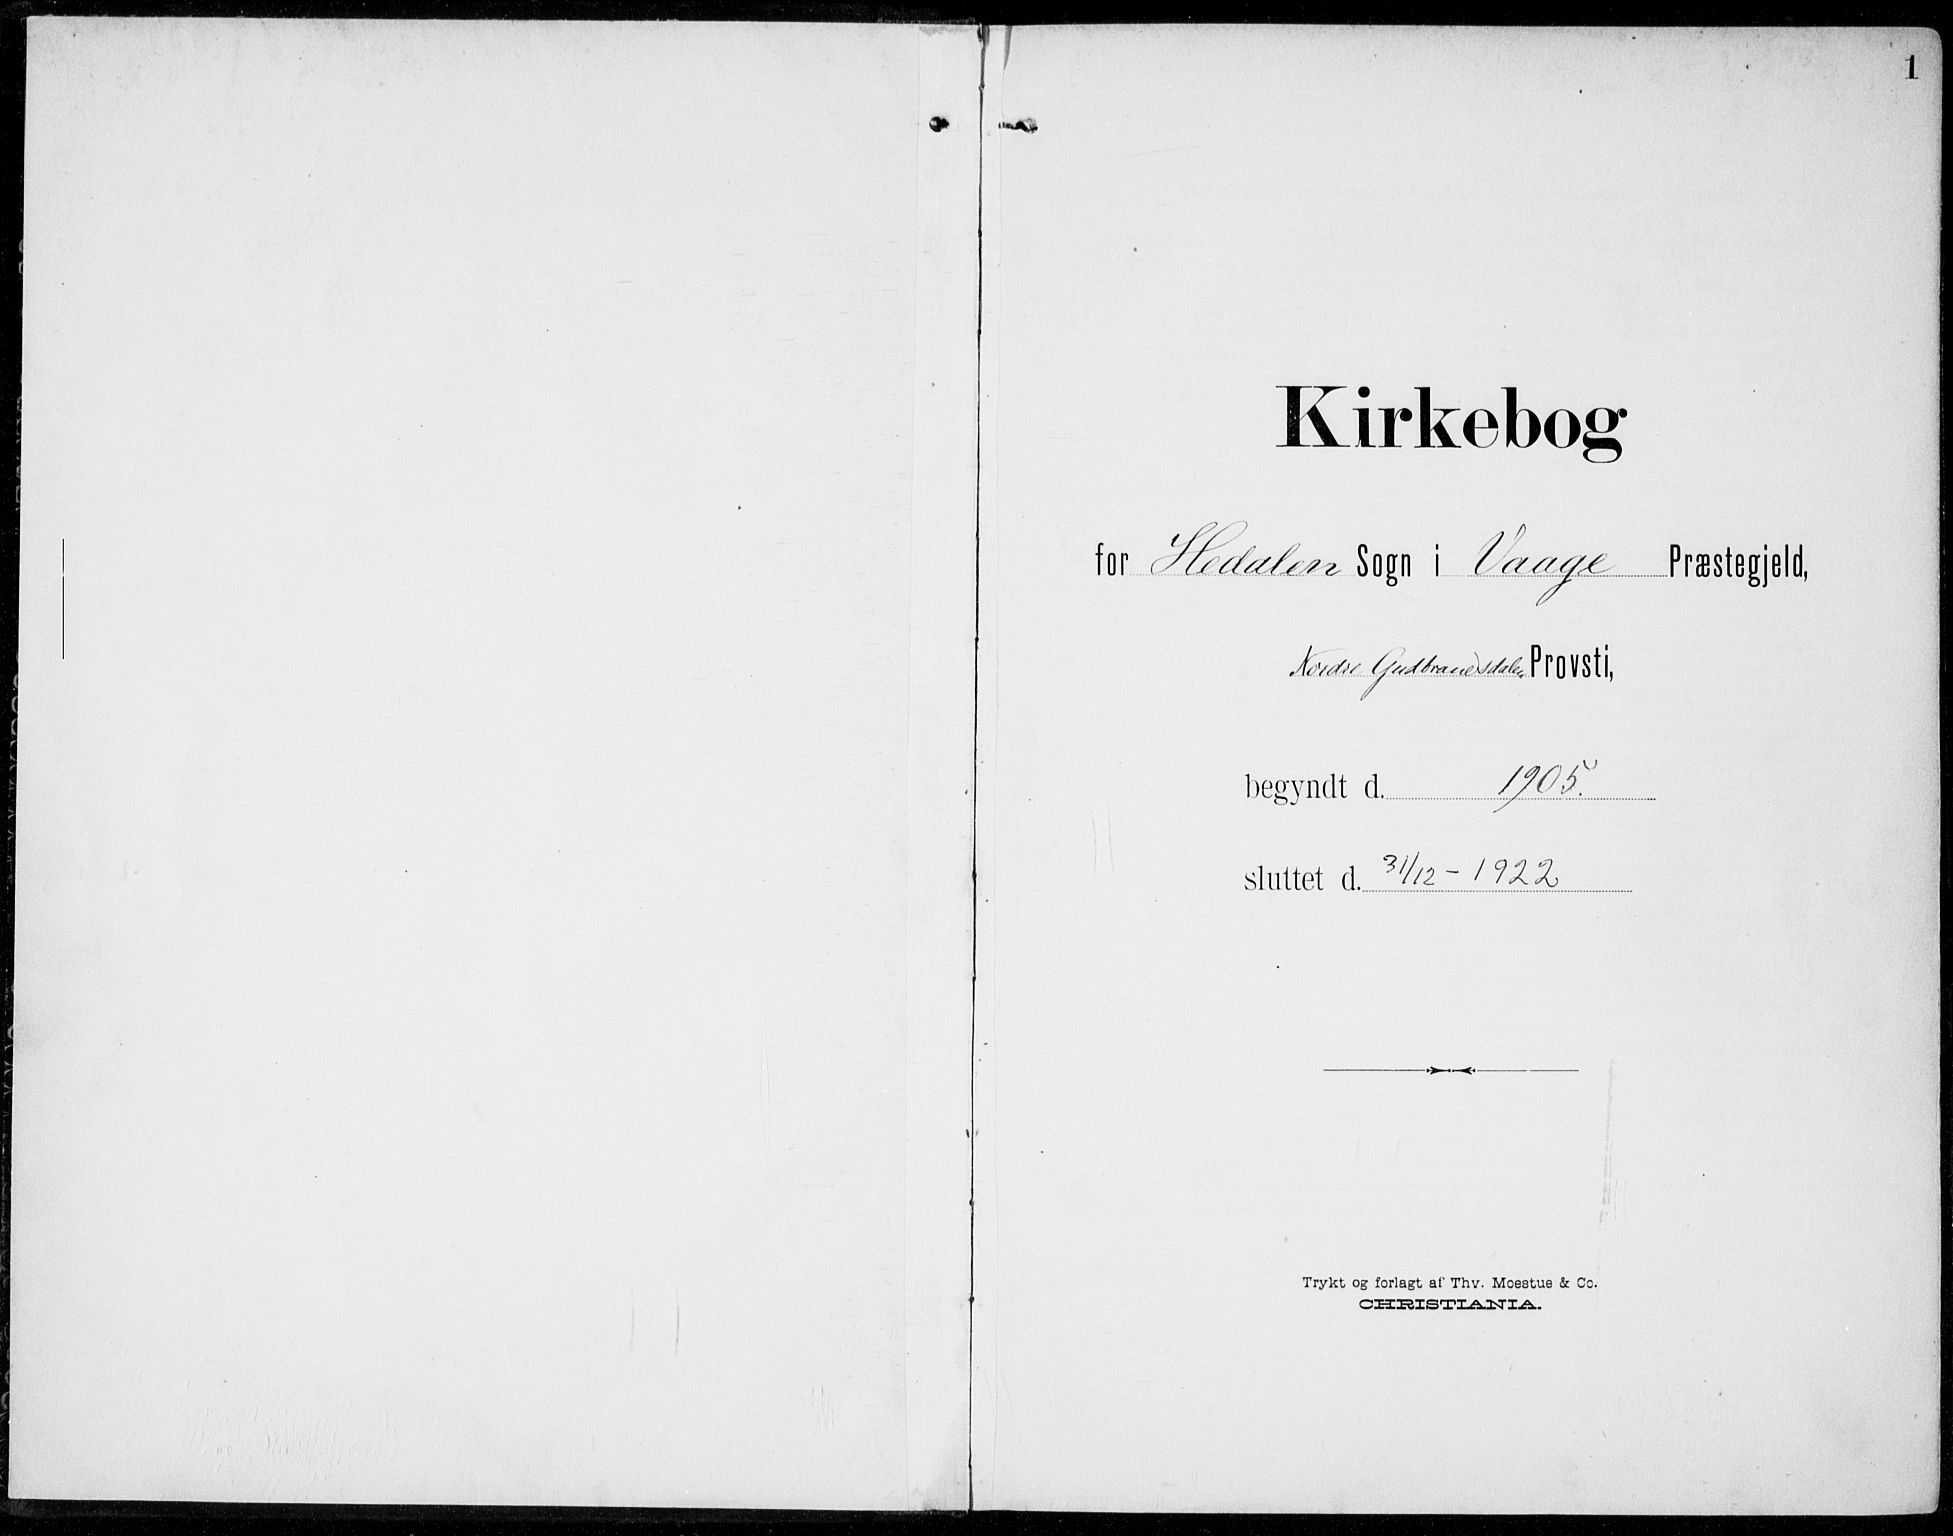 SAH, Sel prestekontor, Ministerialbok nr. 1, 1905-1922, s. 1